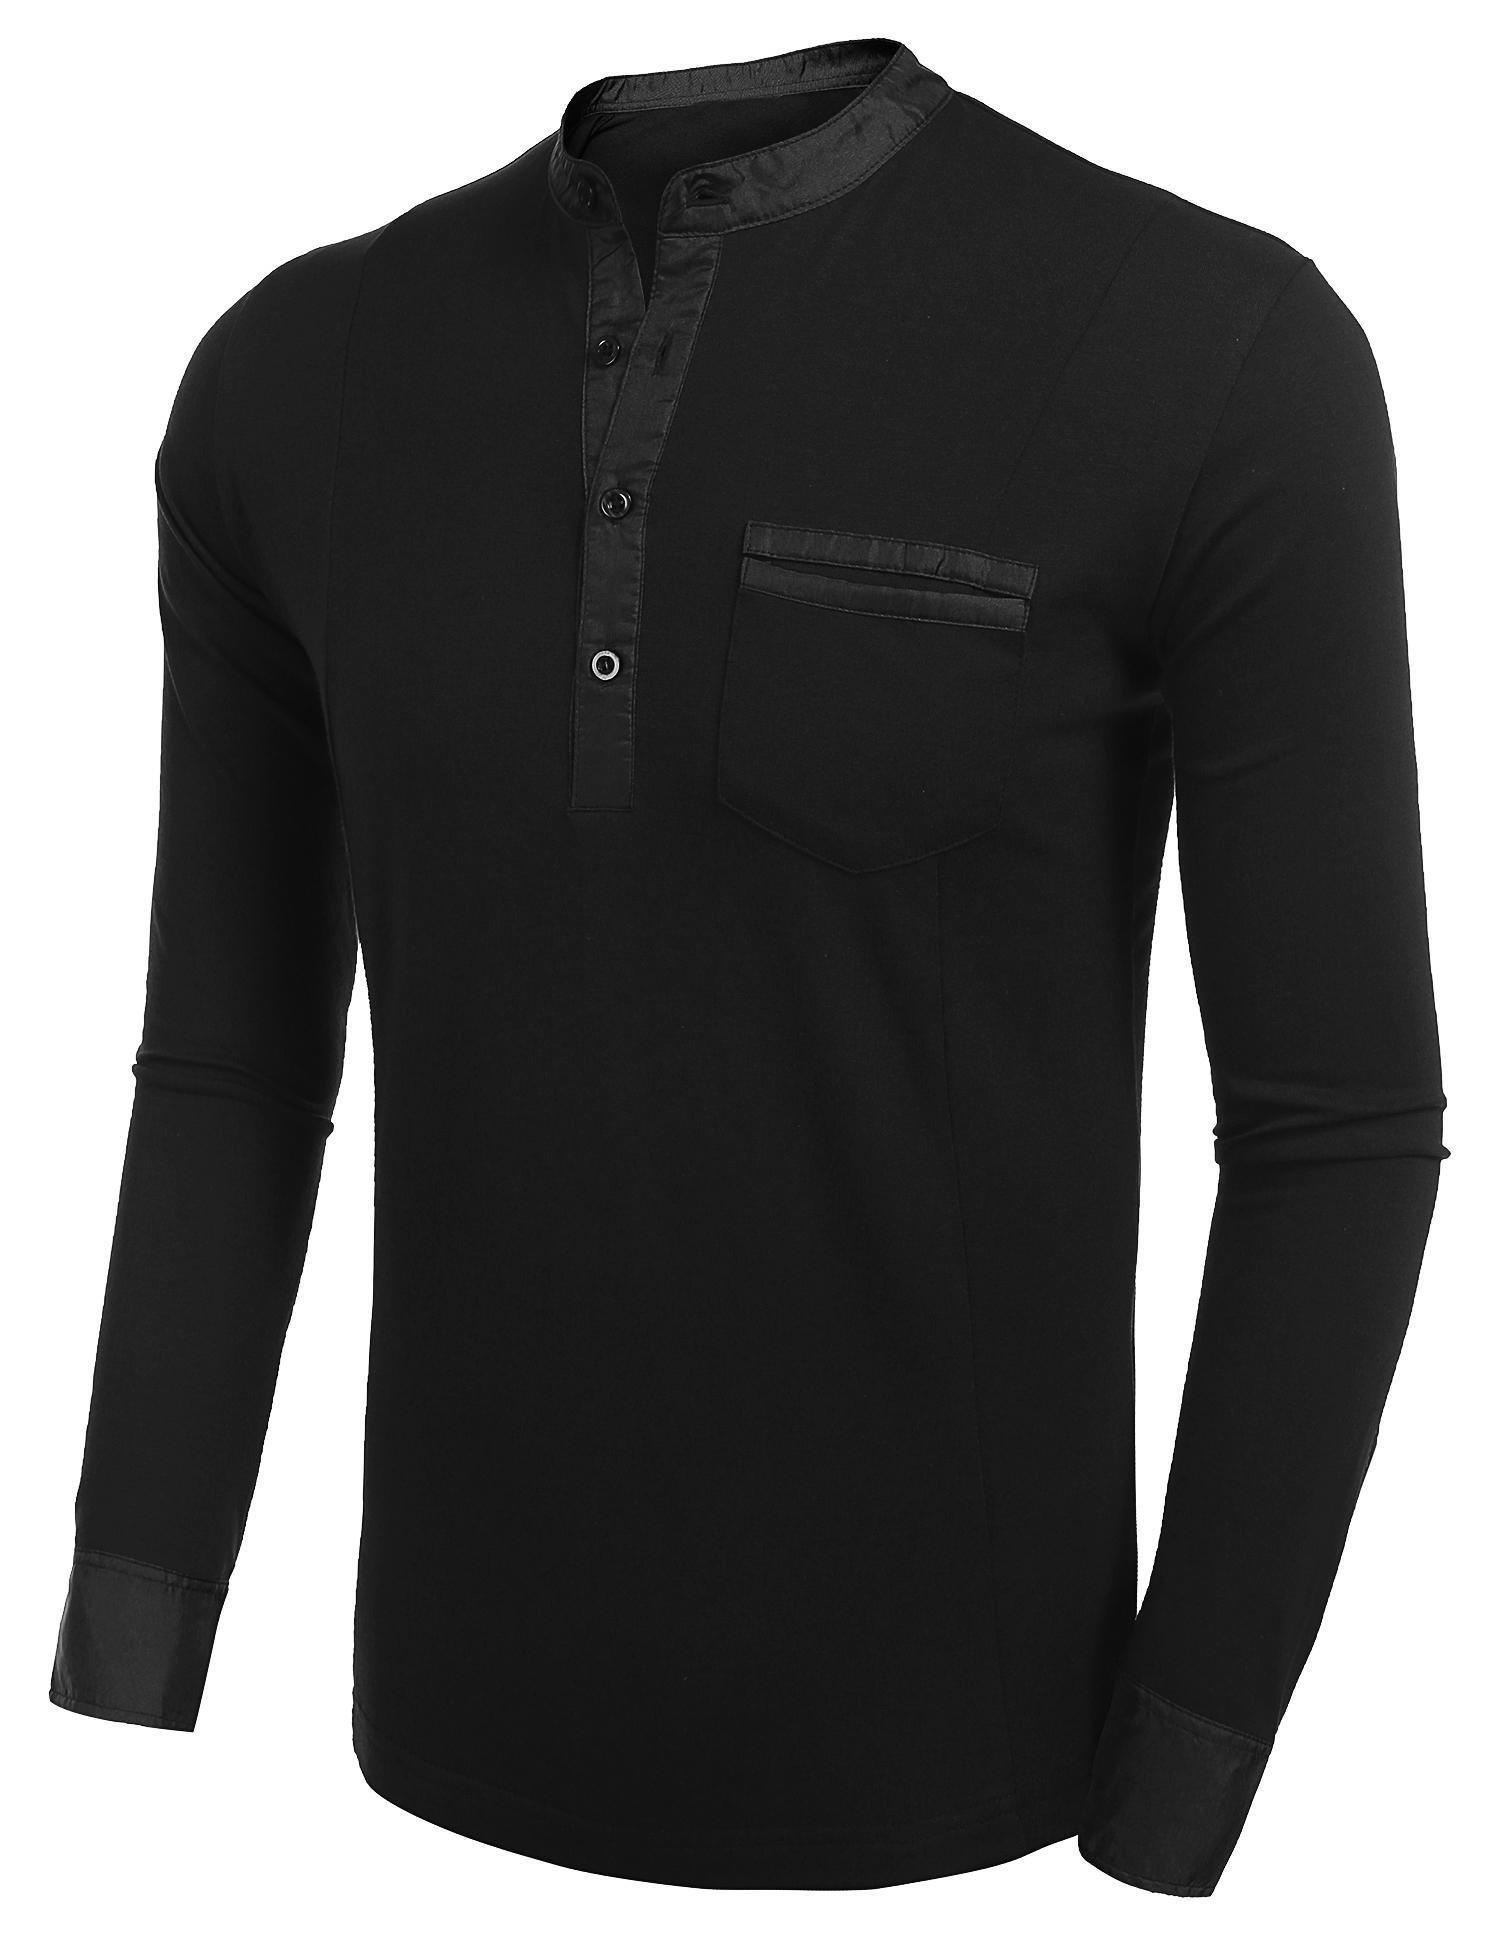 BULGES Men Casual Stand Collar Long Sleeve Polo T-Shirt S-XXL